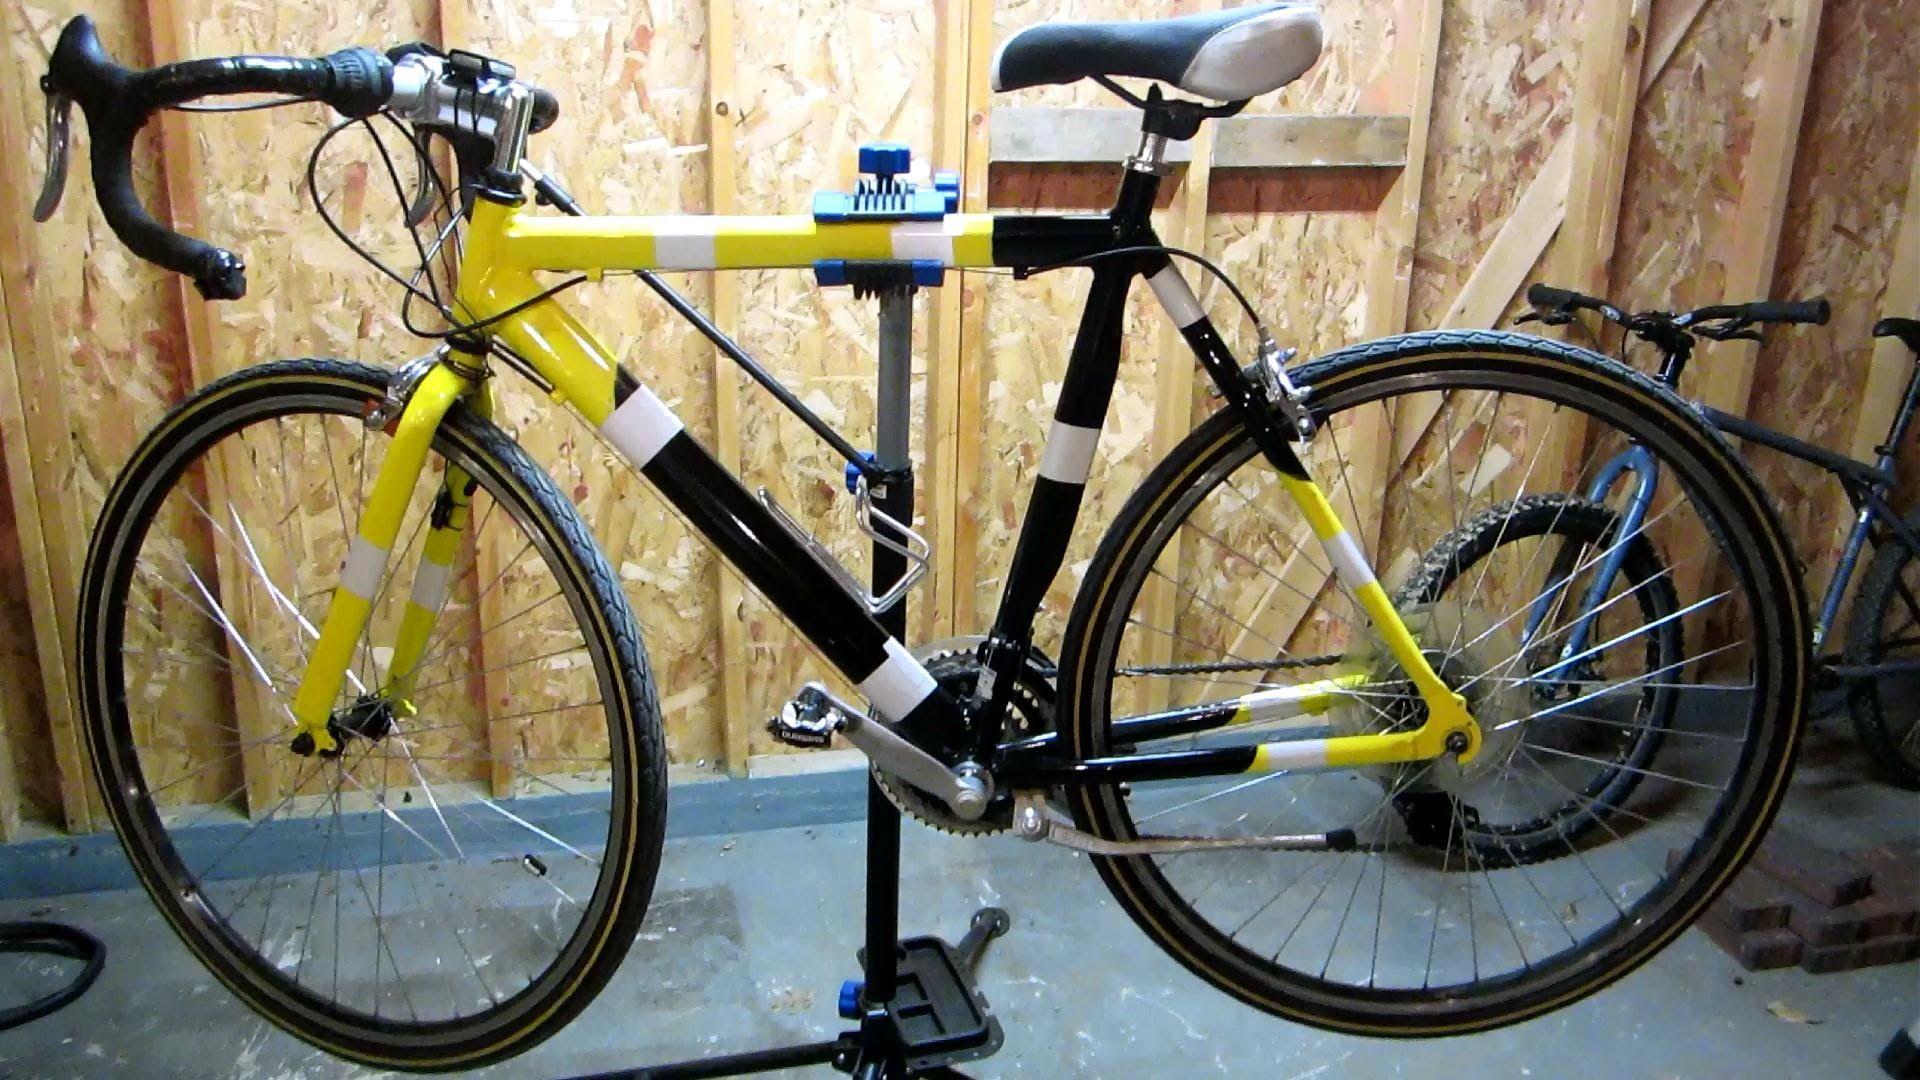 Gmc Denali Road Bike Review Gmc Road Bike Experience Bike